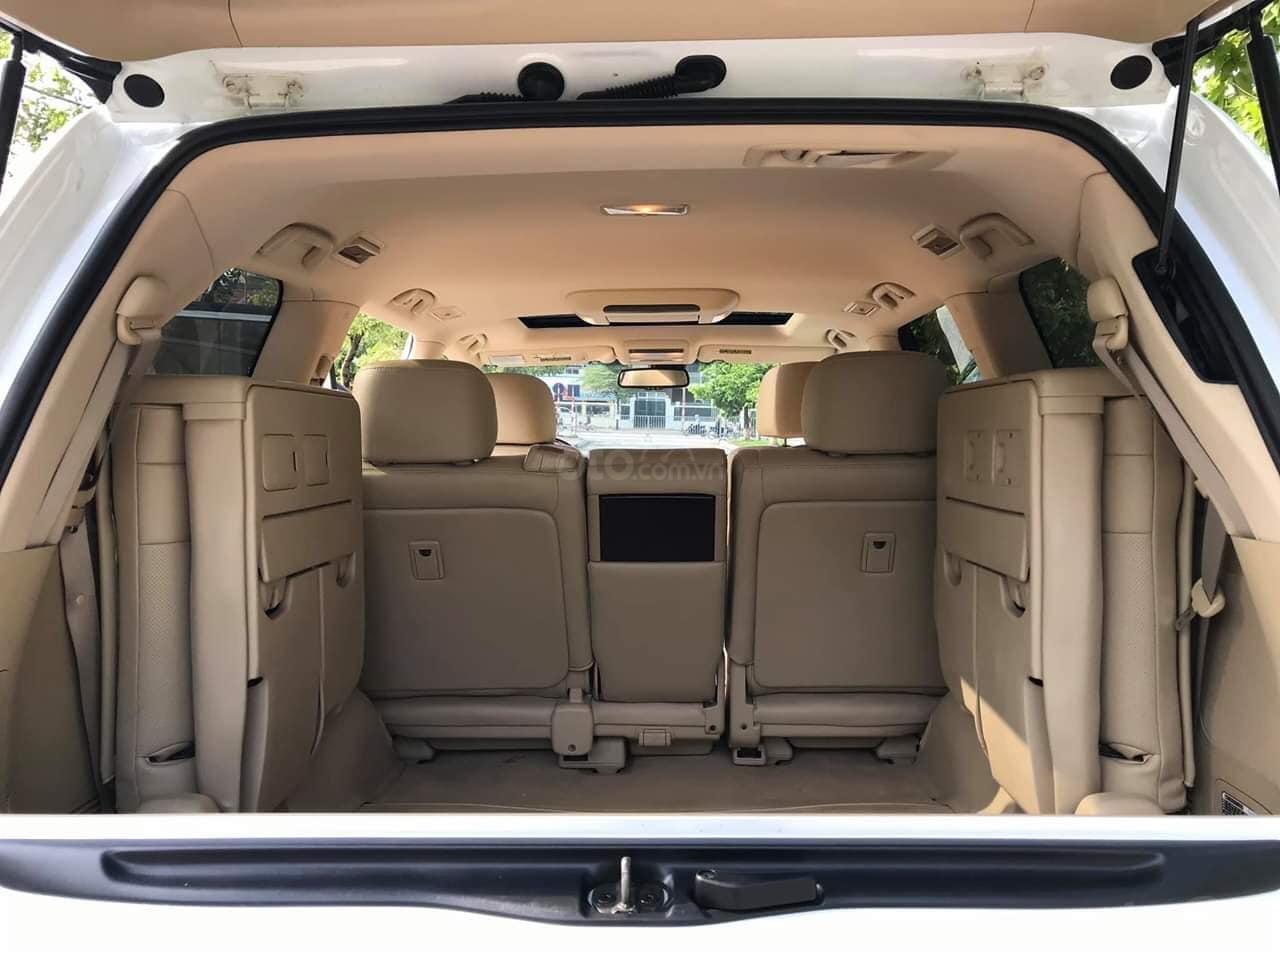 Giao ngay giao ngay Lexus LX570 trắng kem 2010 nhập Mỹ uy tín giá tốt (5)